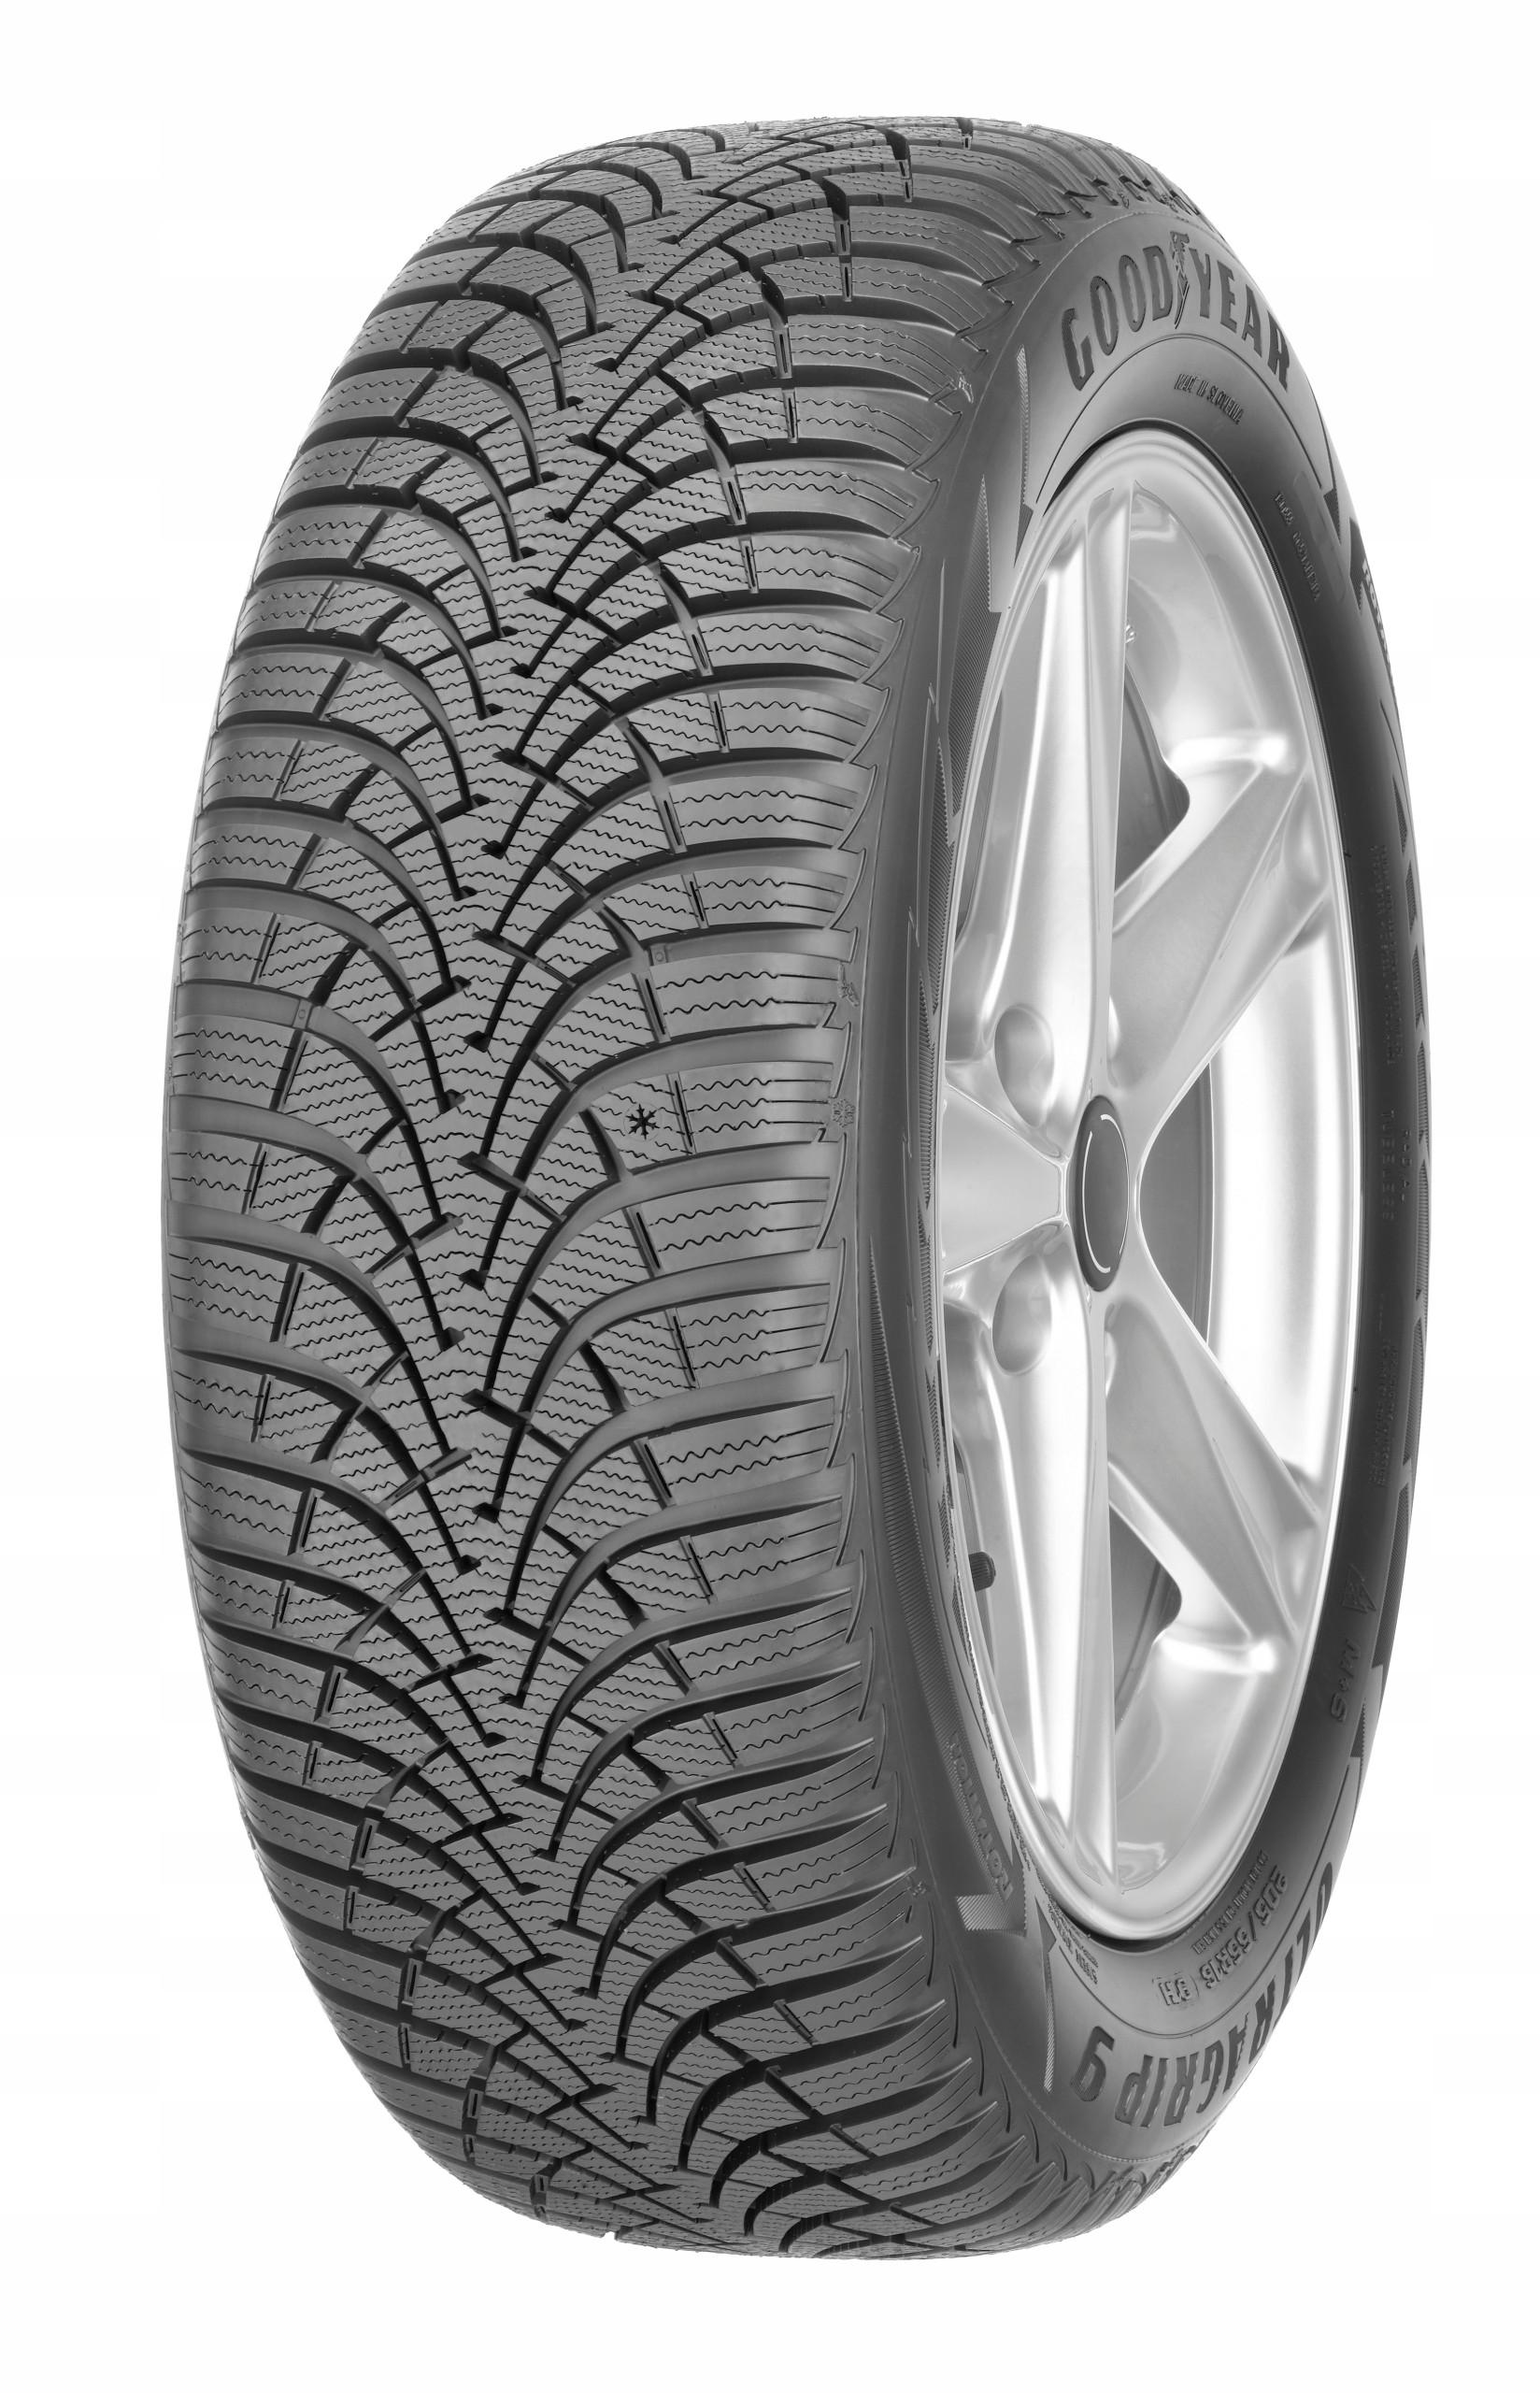 Neumático GOODYEAR UG9+ 175/65R14 86 T